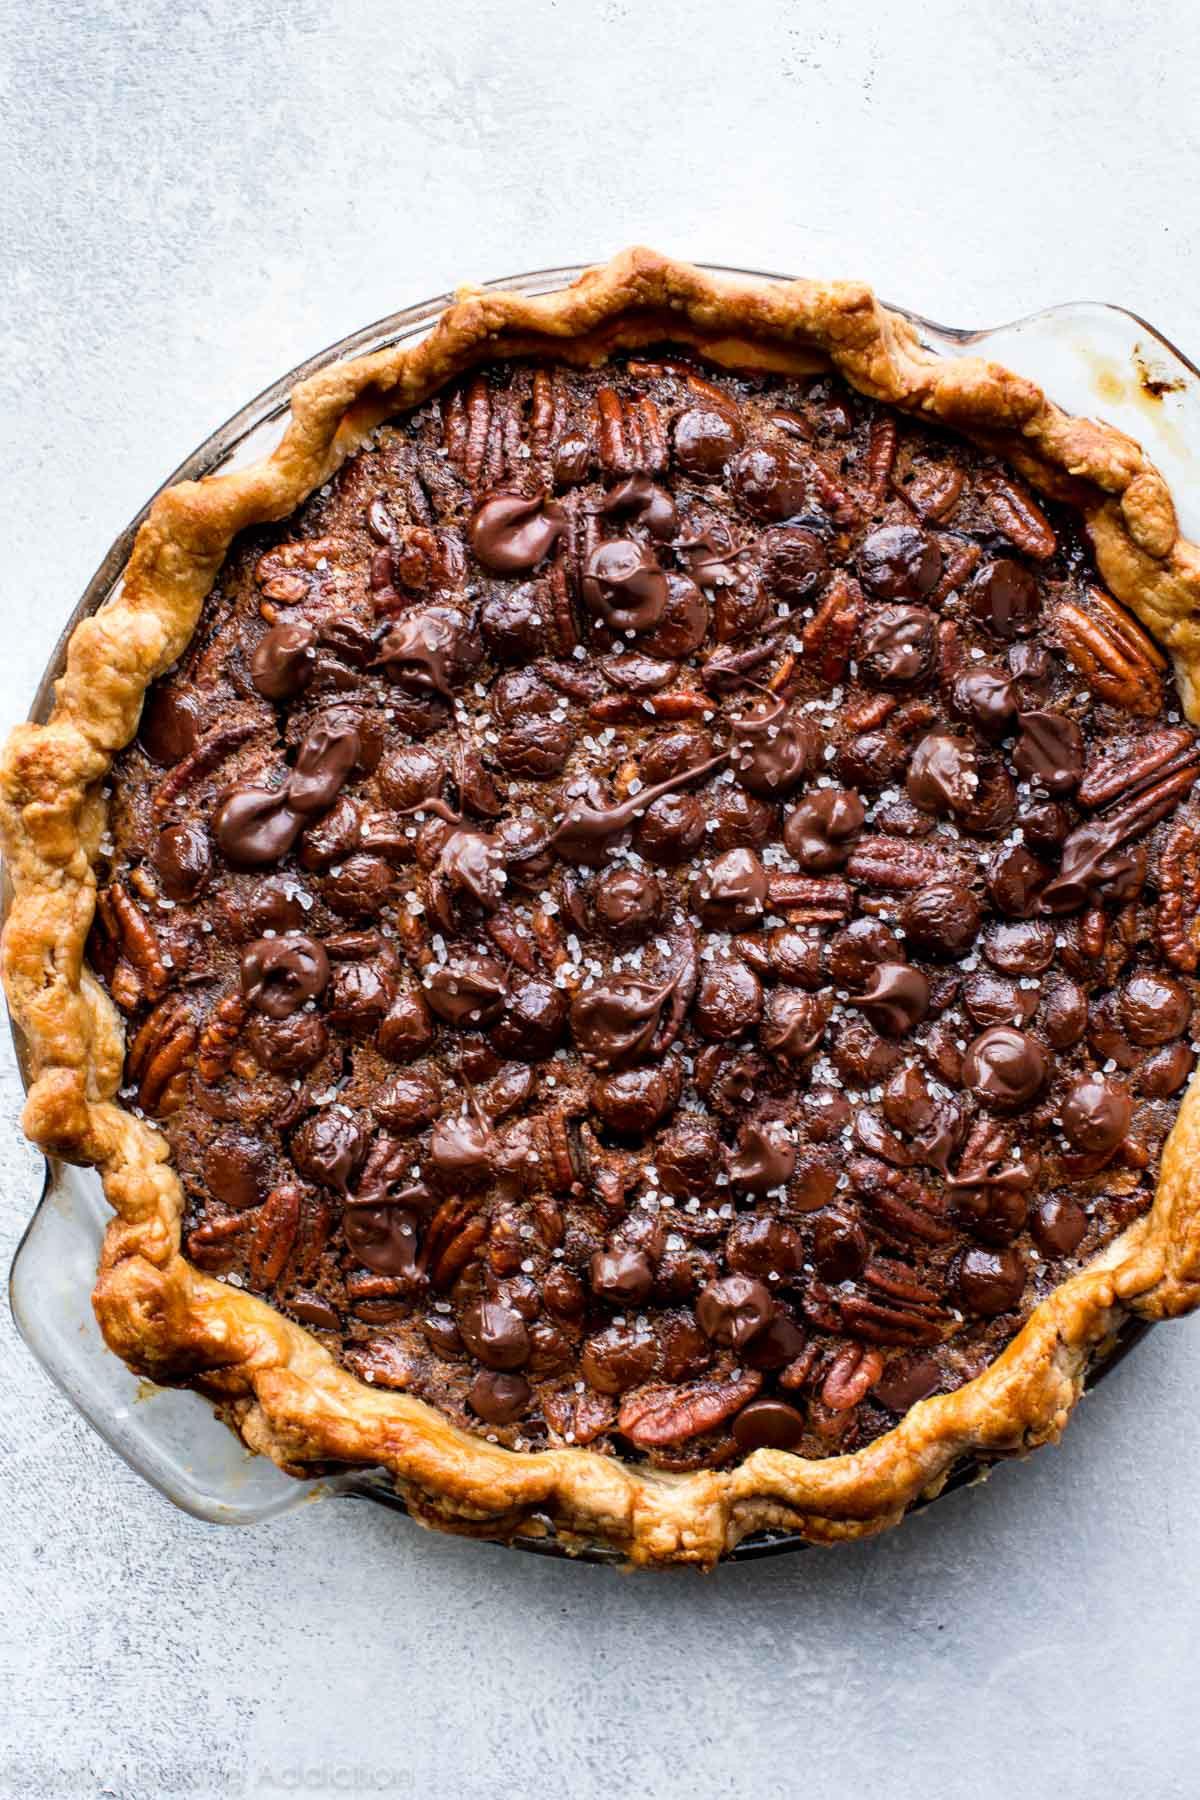 Chocolate Pecan Pie  Dark Chocolate Pecan Pie Sallys Baking Addiction